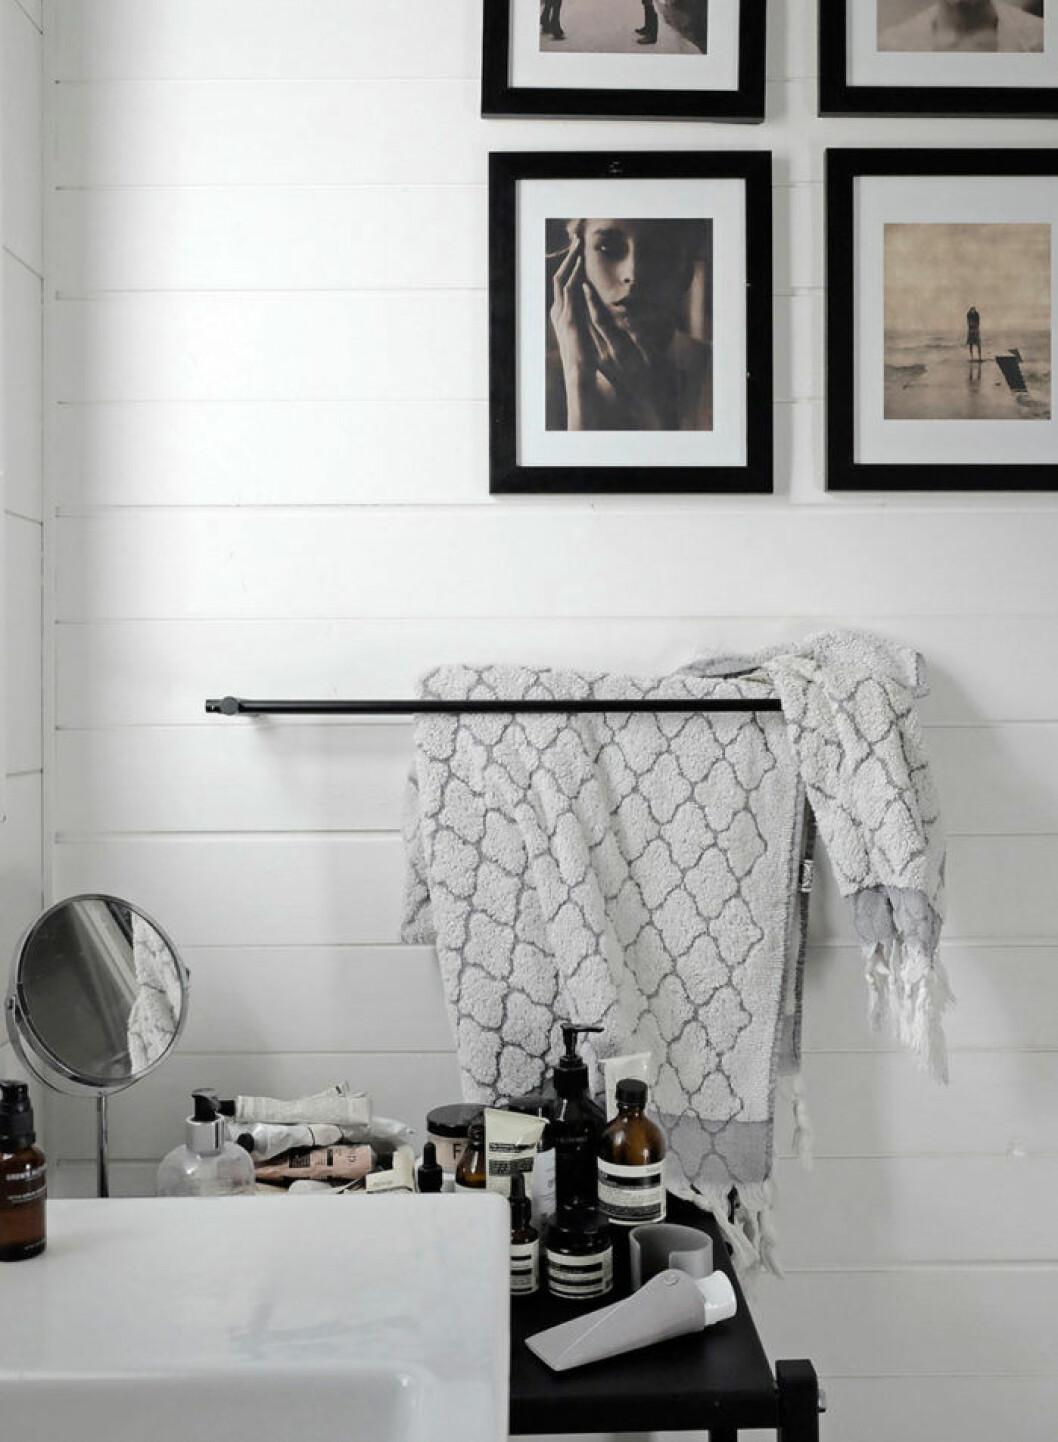 Badrummet andas lugn och harmoni.